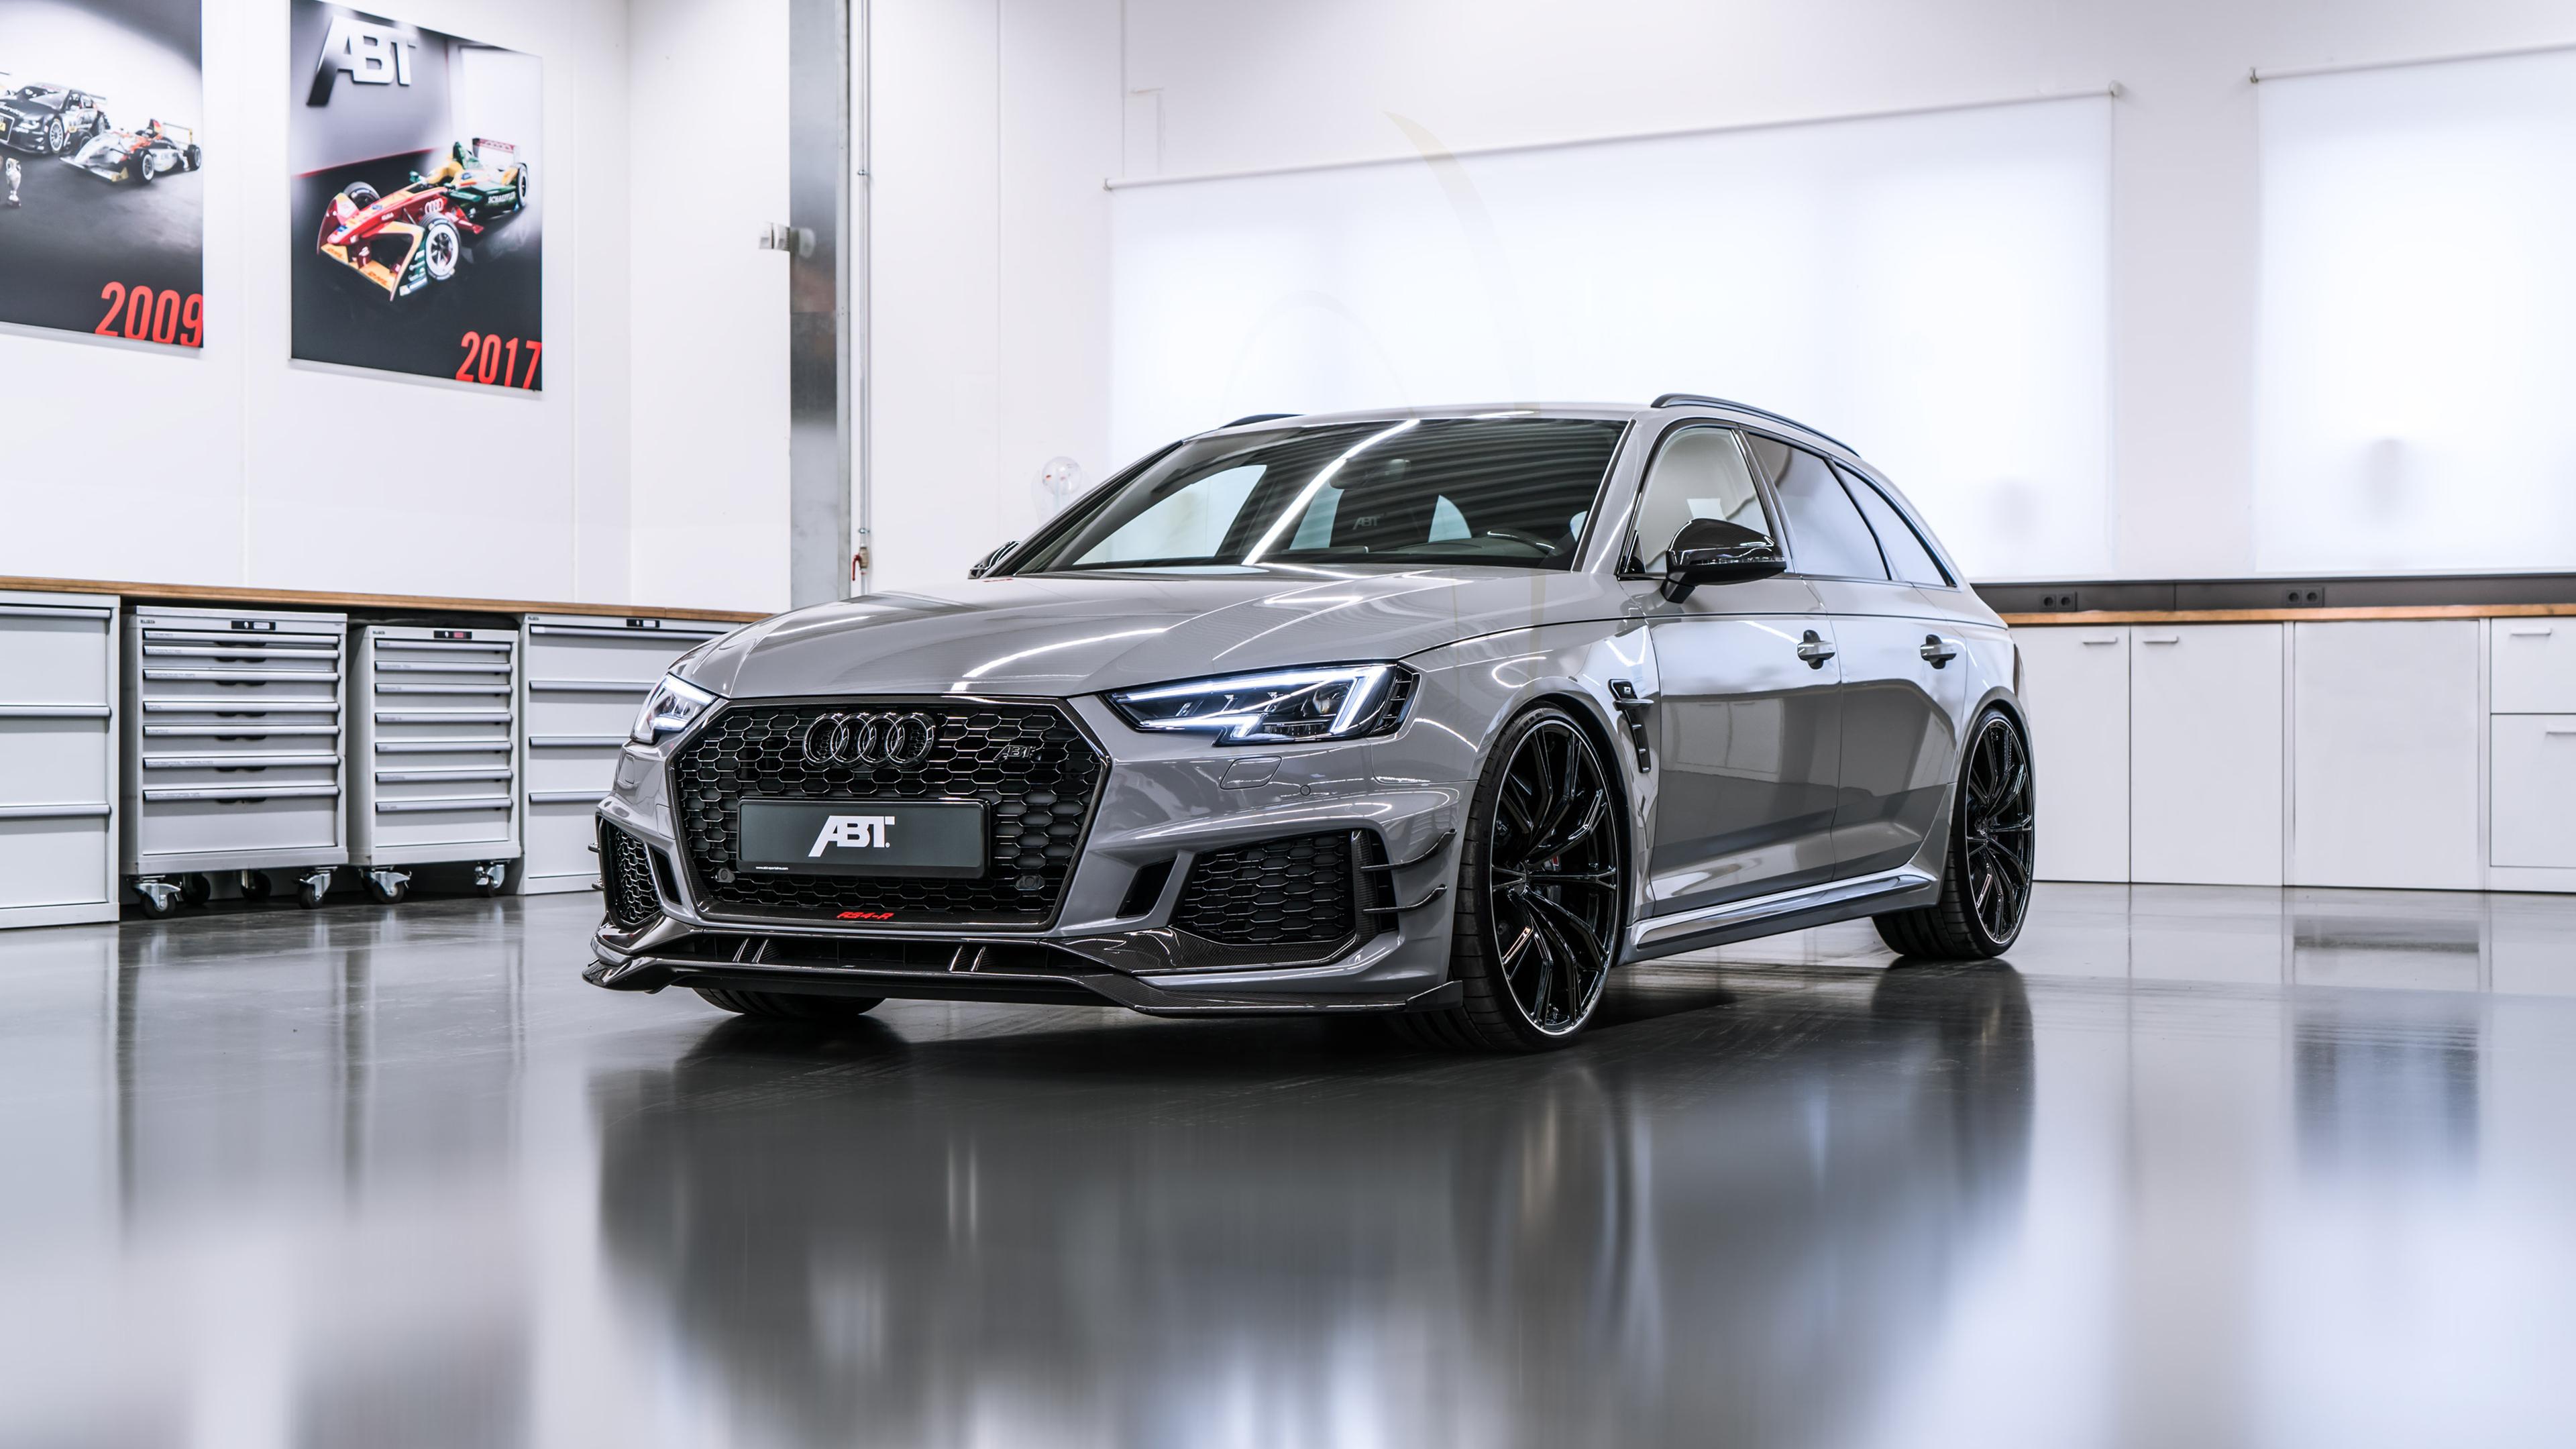 Audi Rs4 Wallpapers Wallpaper Cave